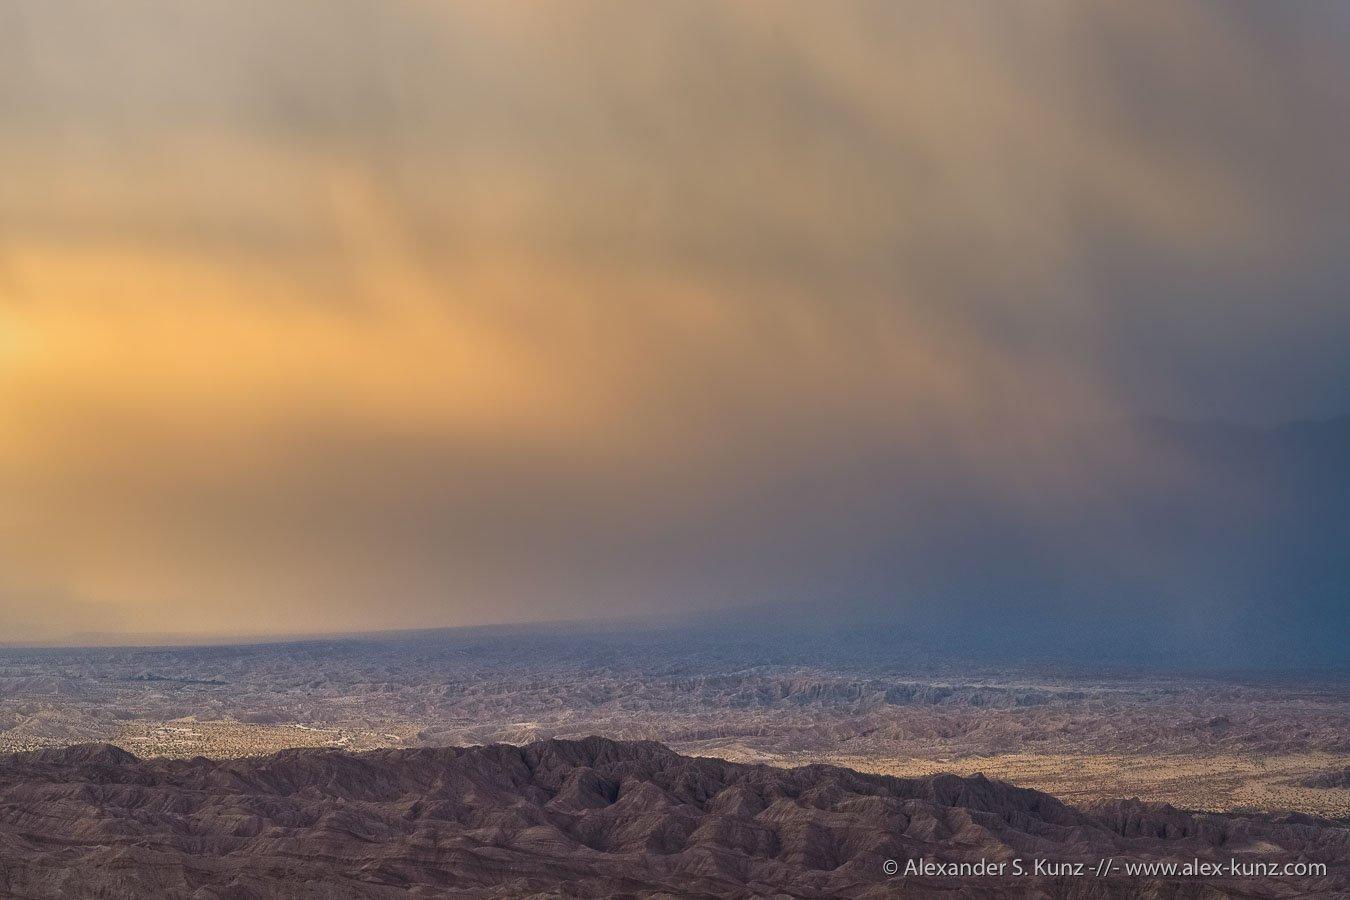 Alexander S. Kunz: Rain Over Empty Desert Landscape